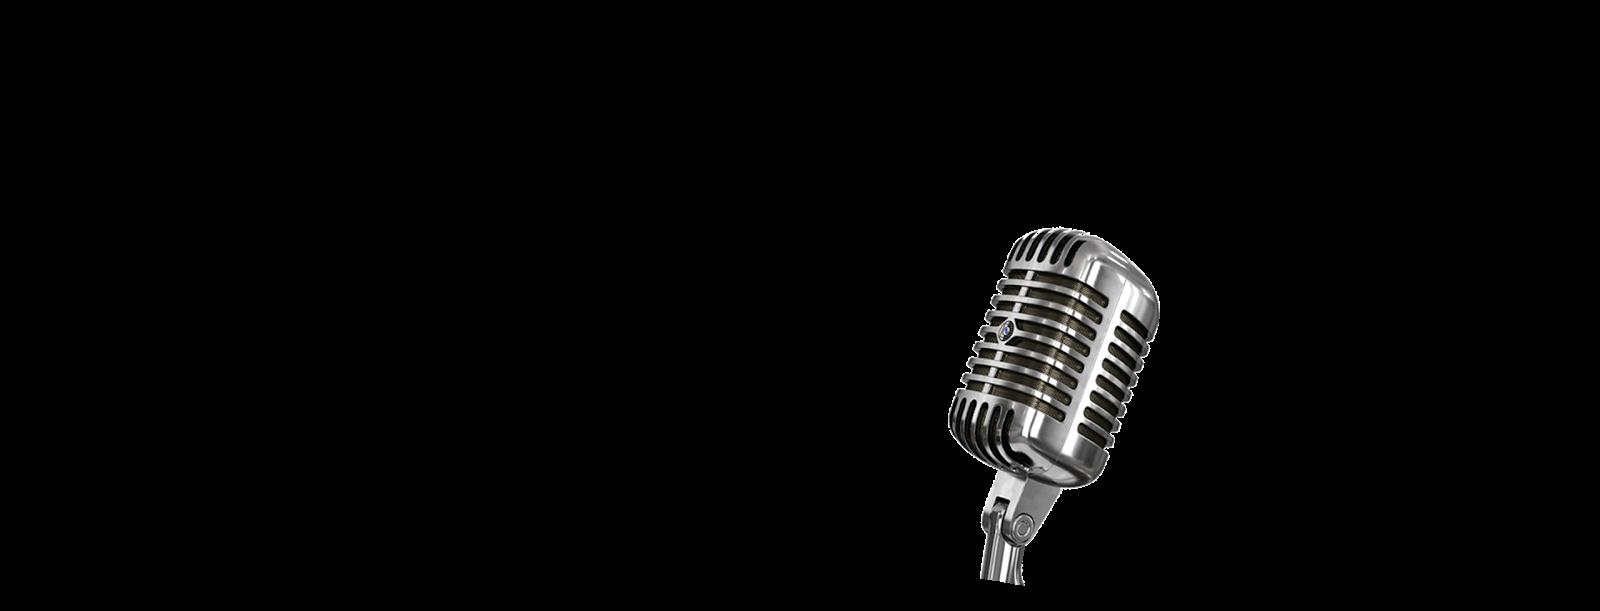 2016 ~ video karaoke  latinka salah ini karaoke carpool.php #6